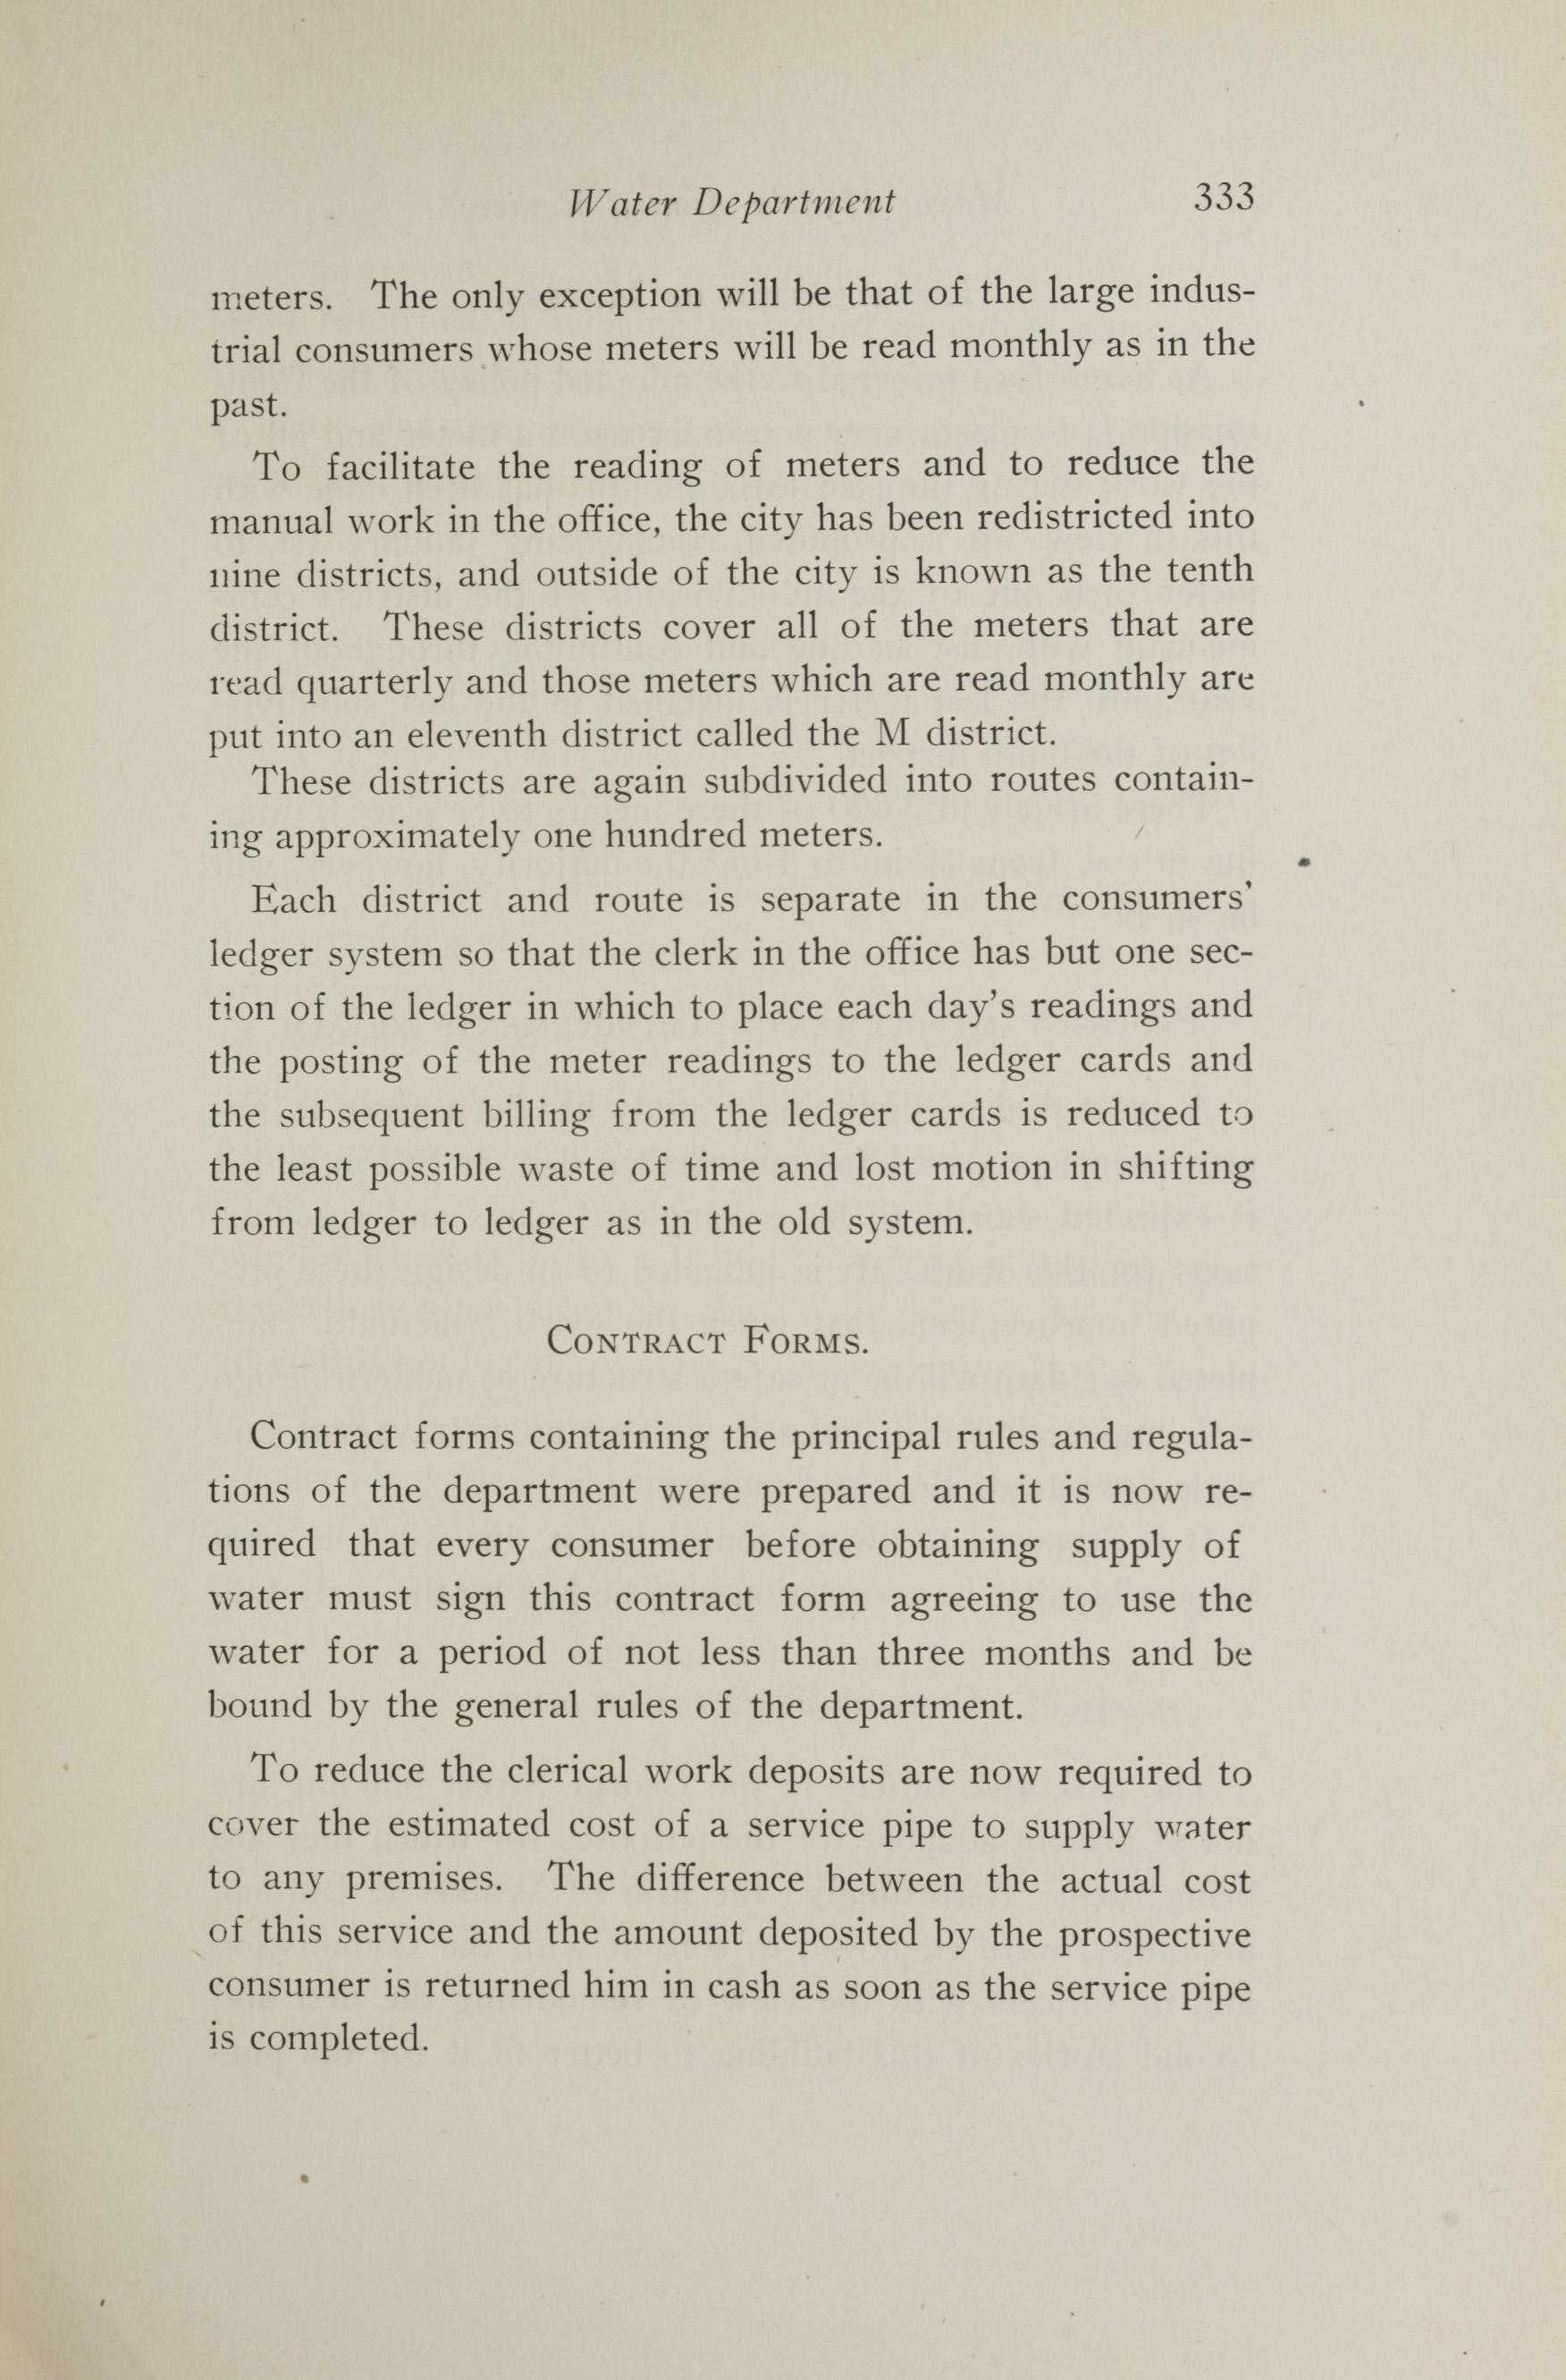 Charleston Yearbook, 1917, page 333